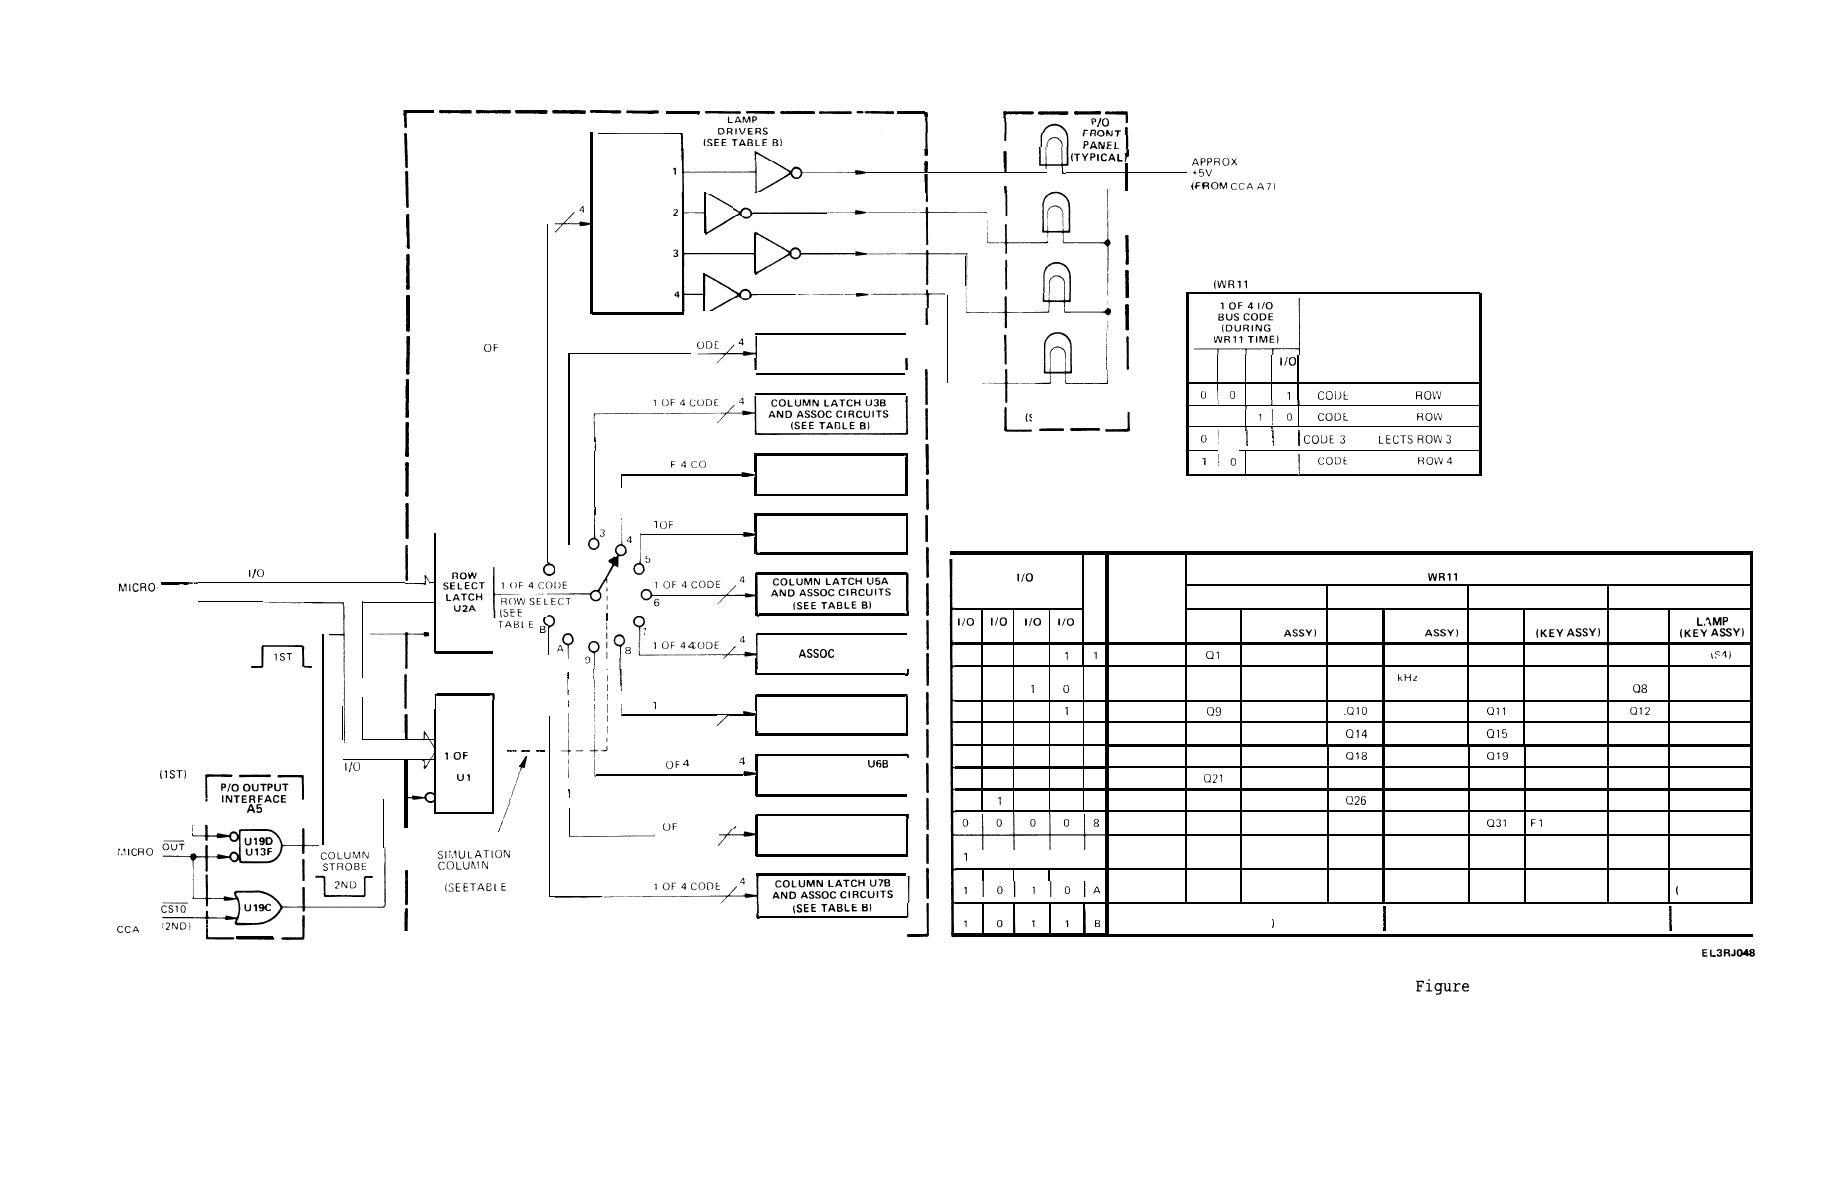 Figure FO-8. Keyboard Lamp Illumination Circuits